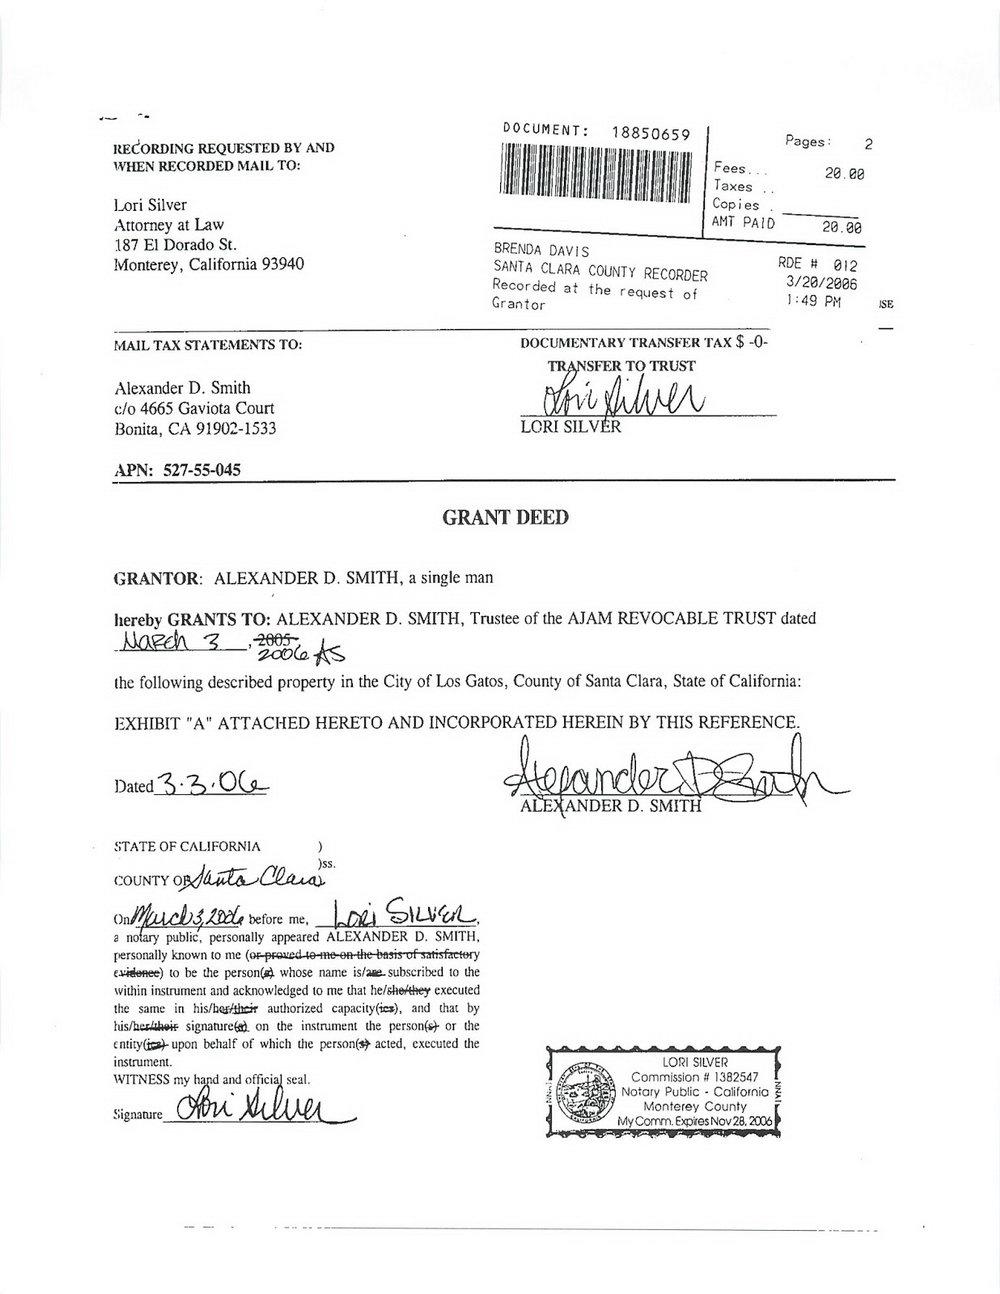 Grant Deed Form Sacramento County